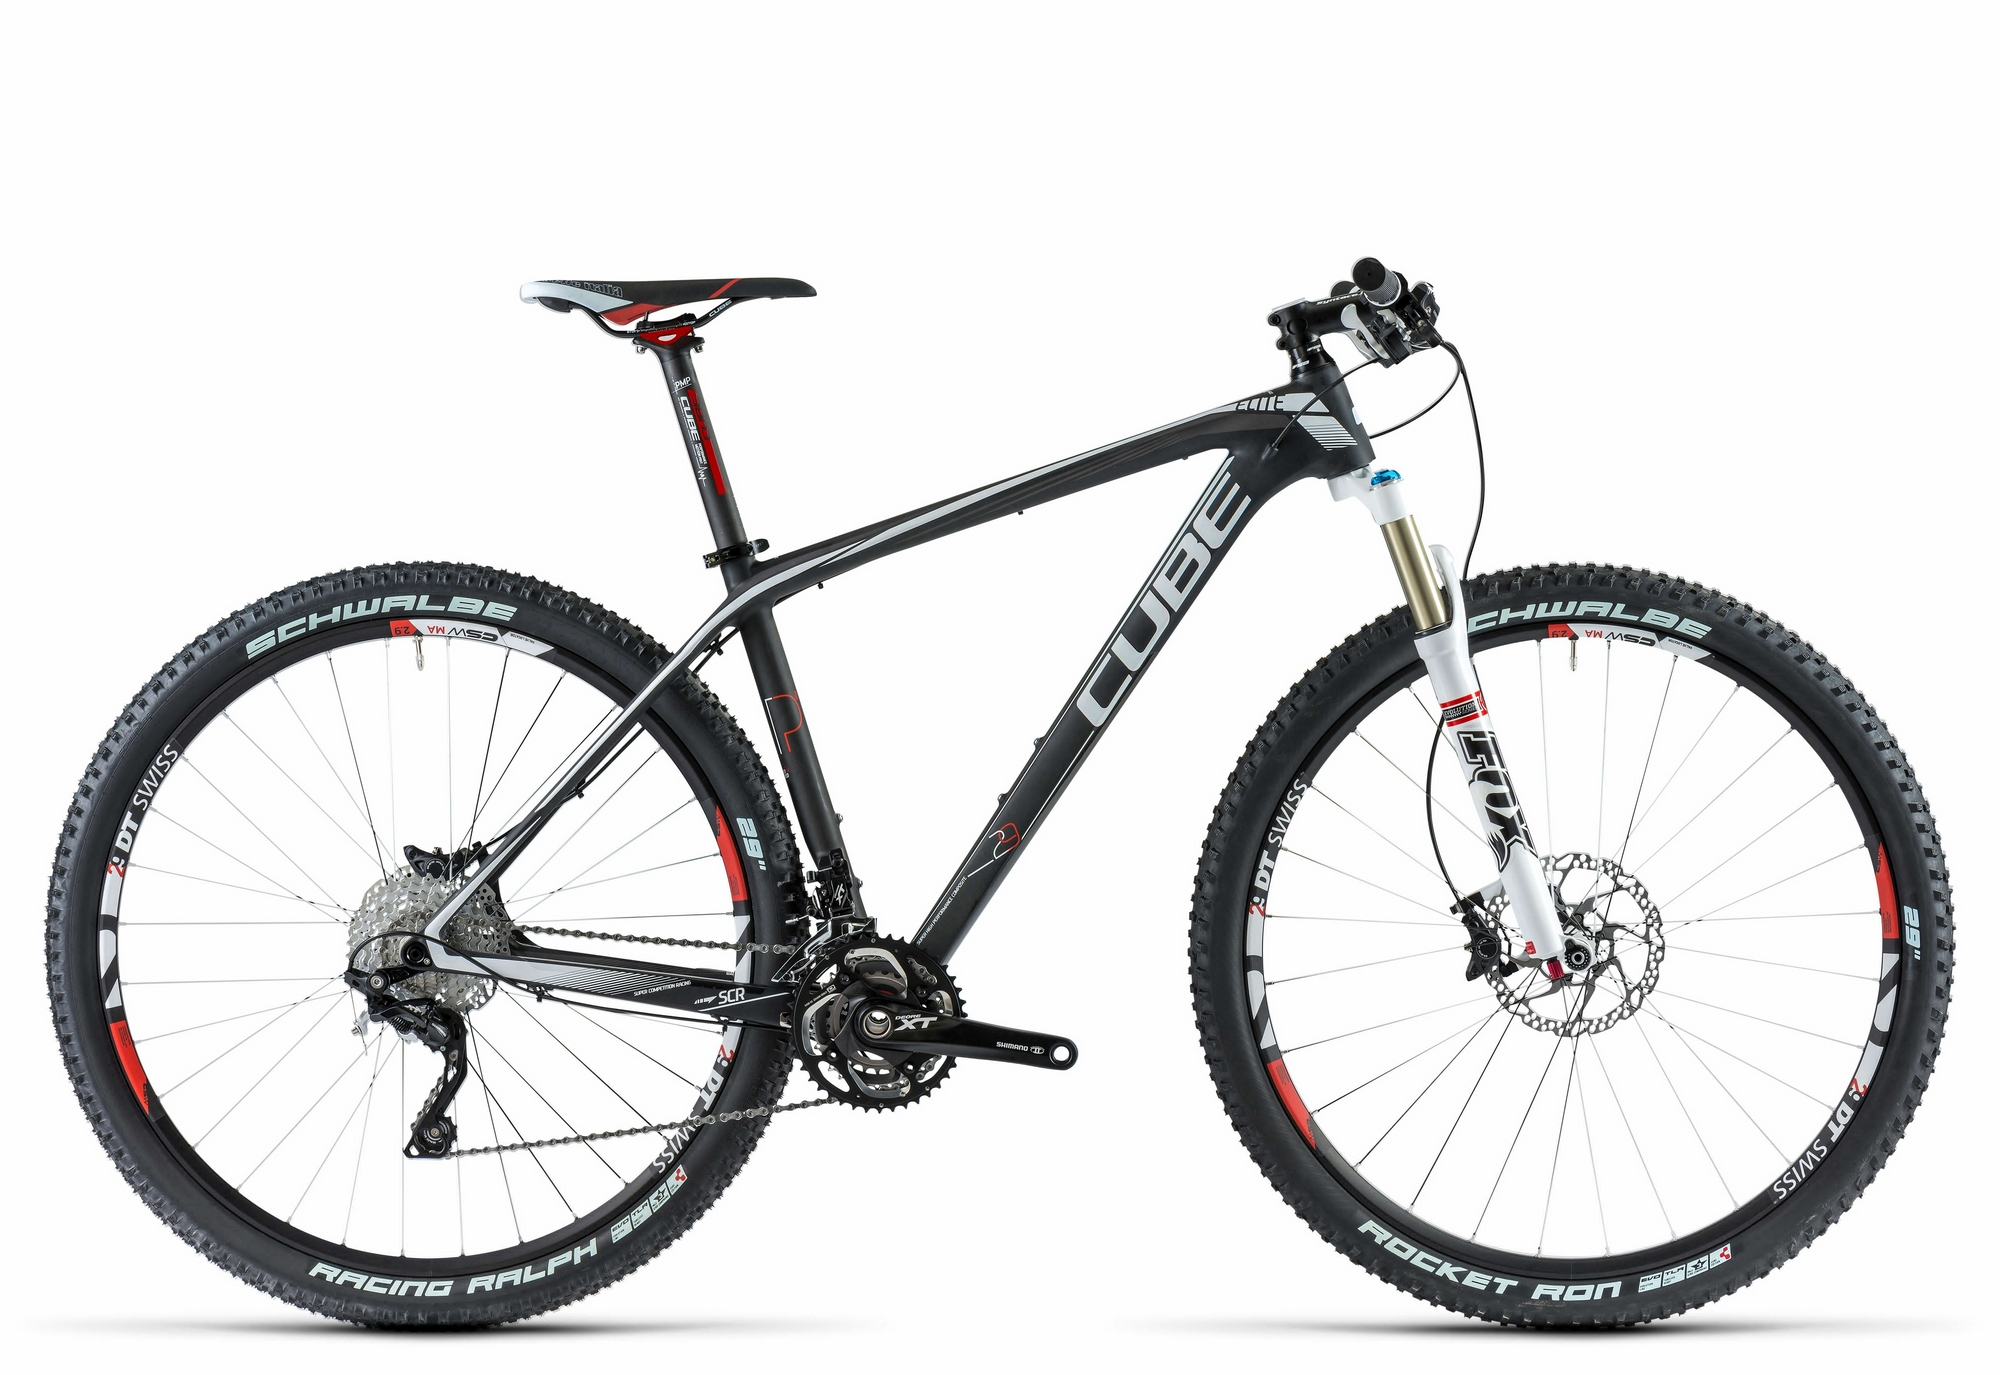 bicicleta cube elite super hpc pro 29 2014 blackline